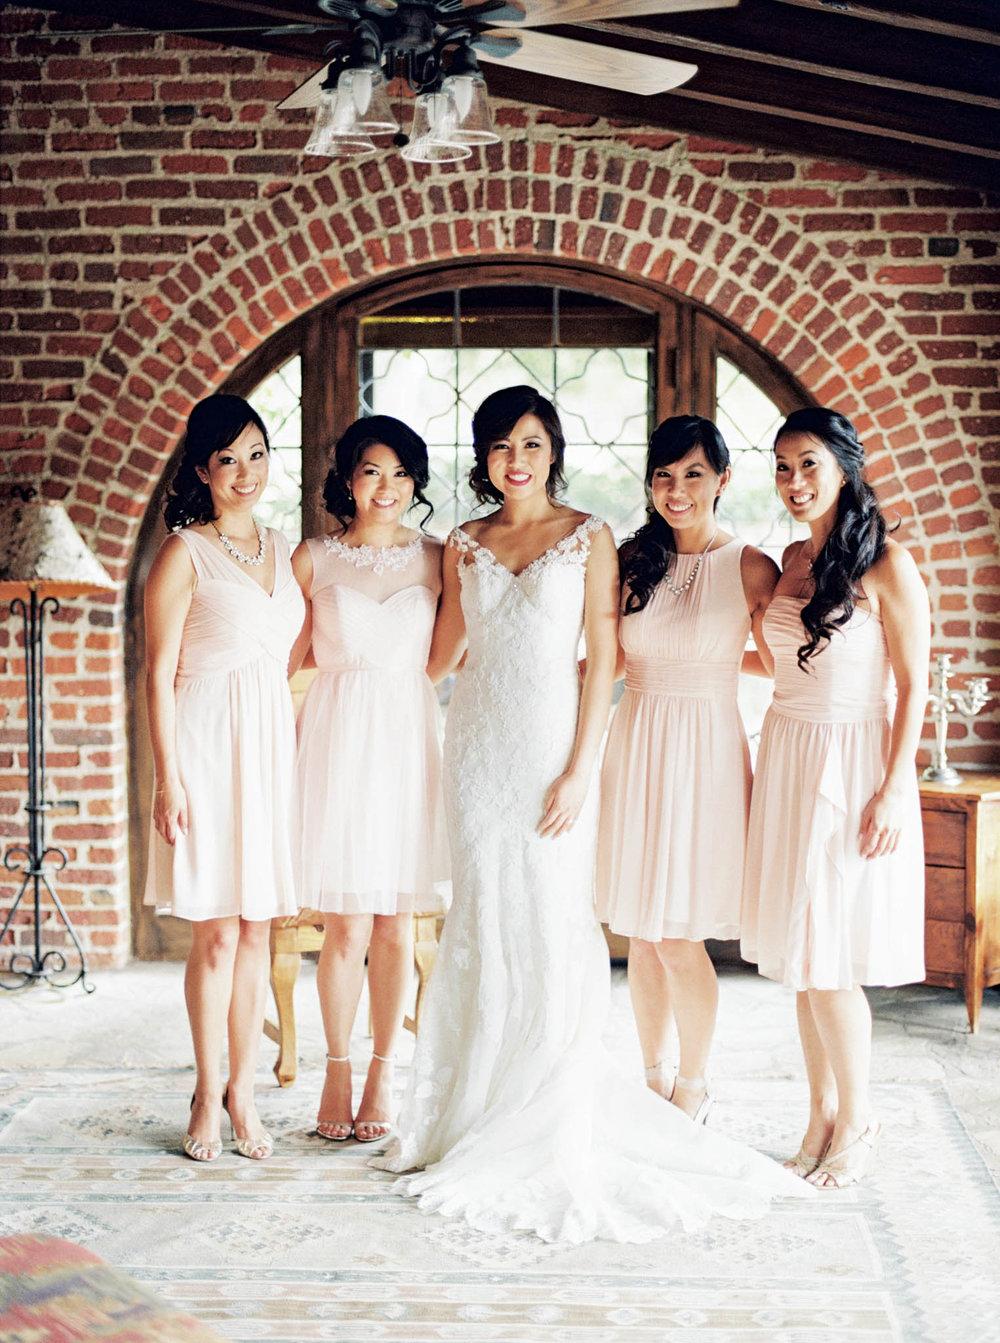 teresa-issac-wedding-88.jpg